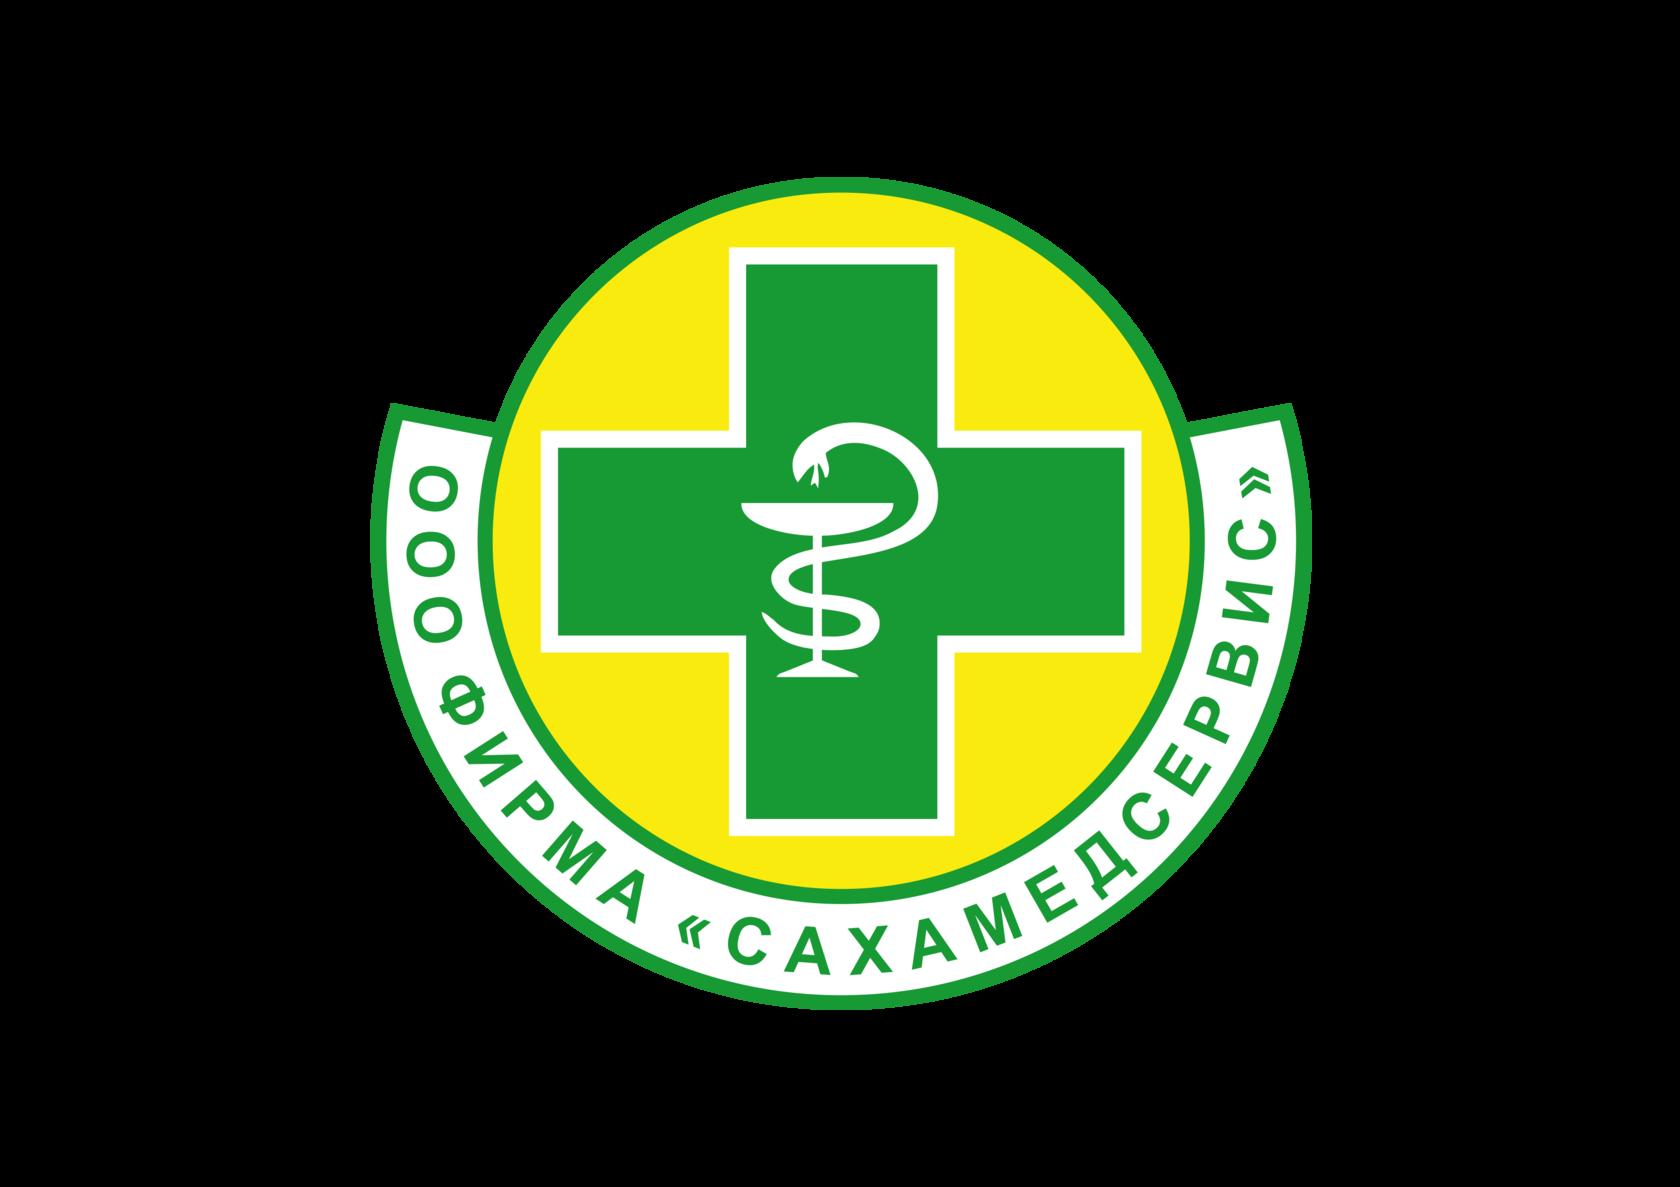 Сахамедсервис